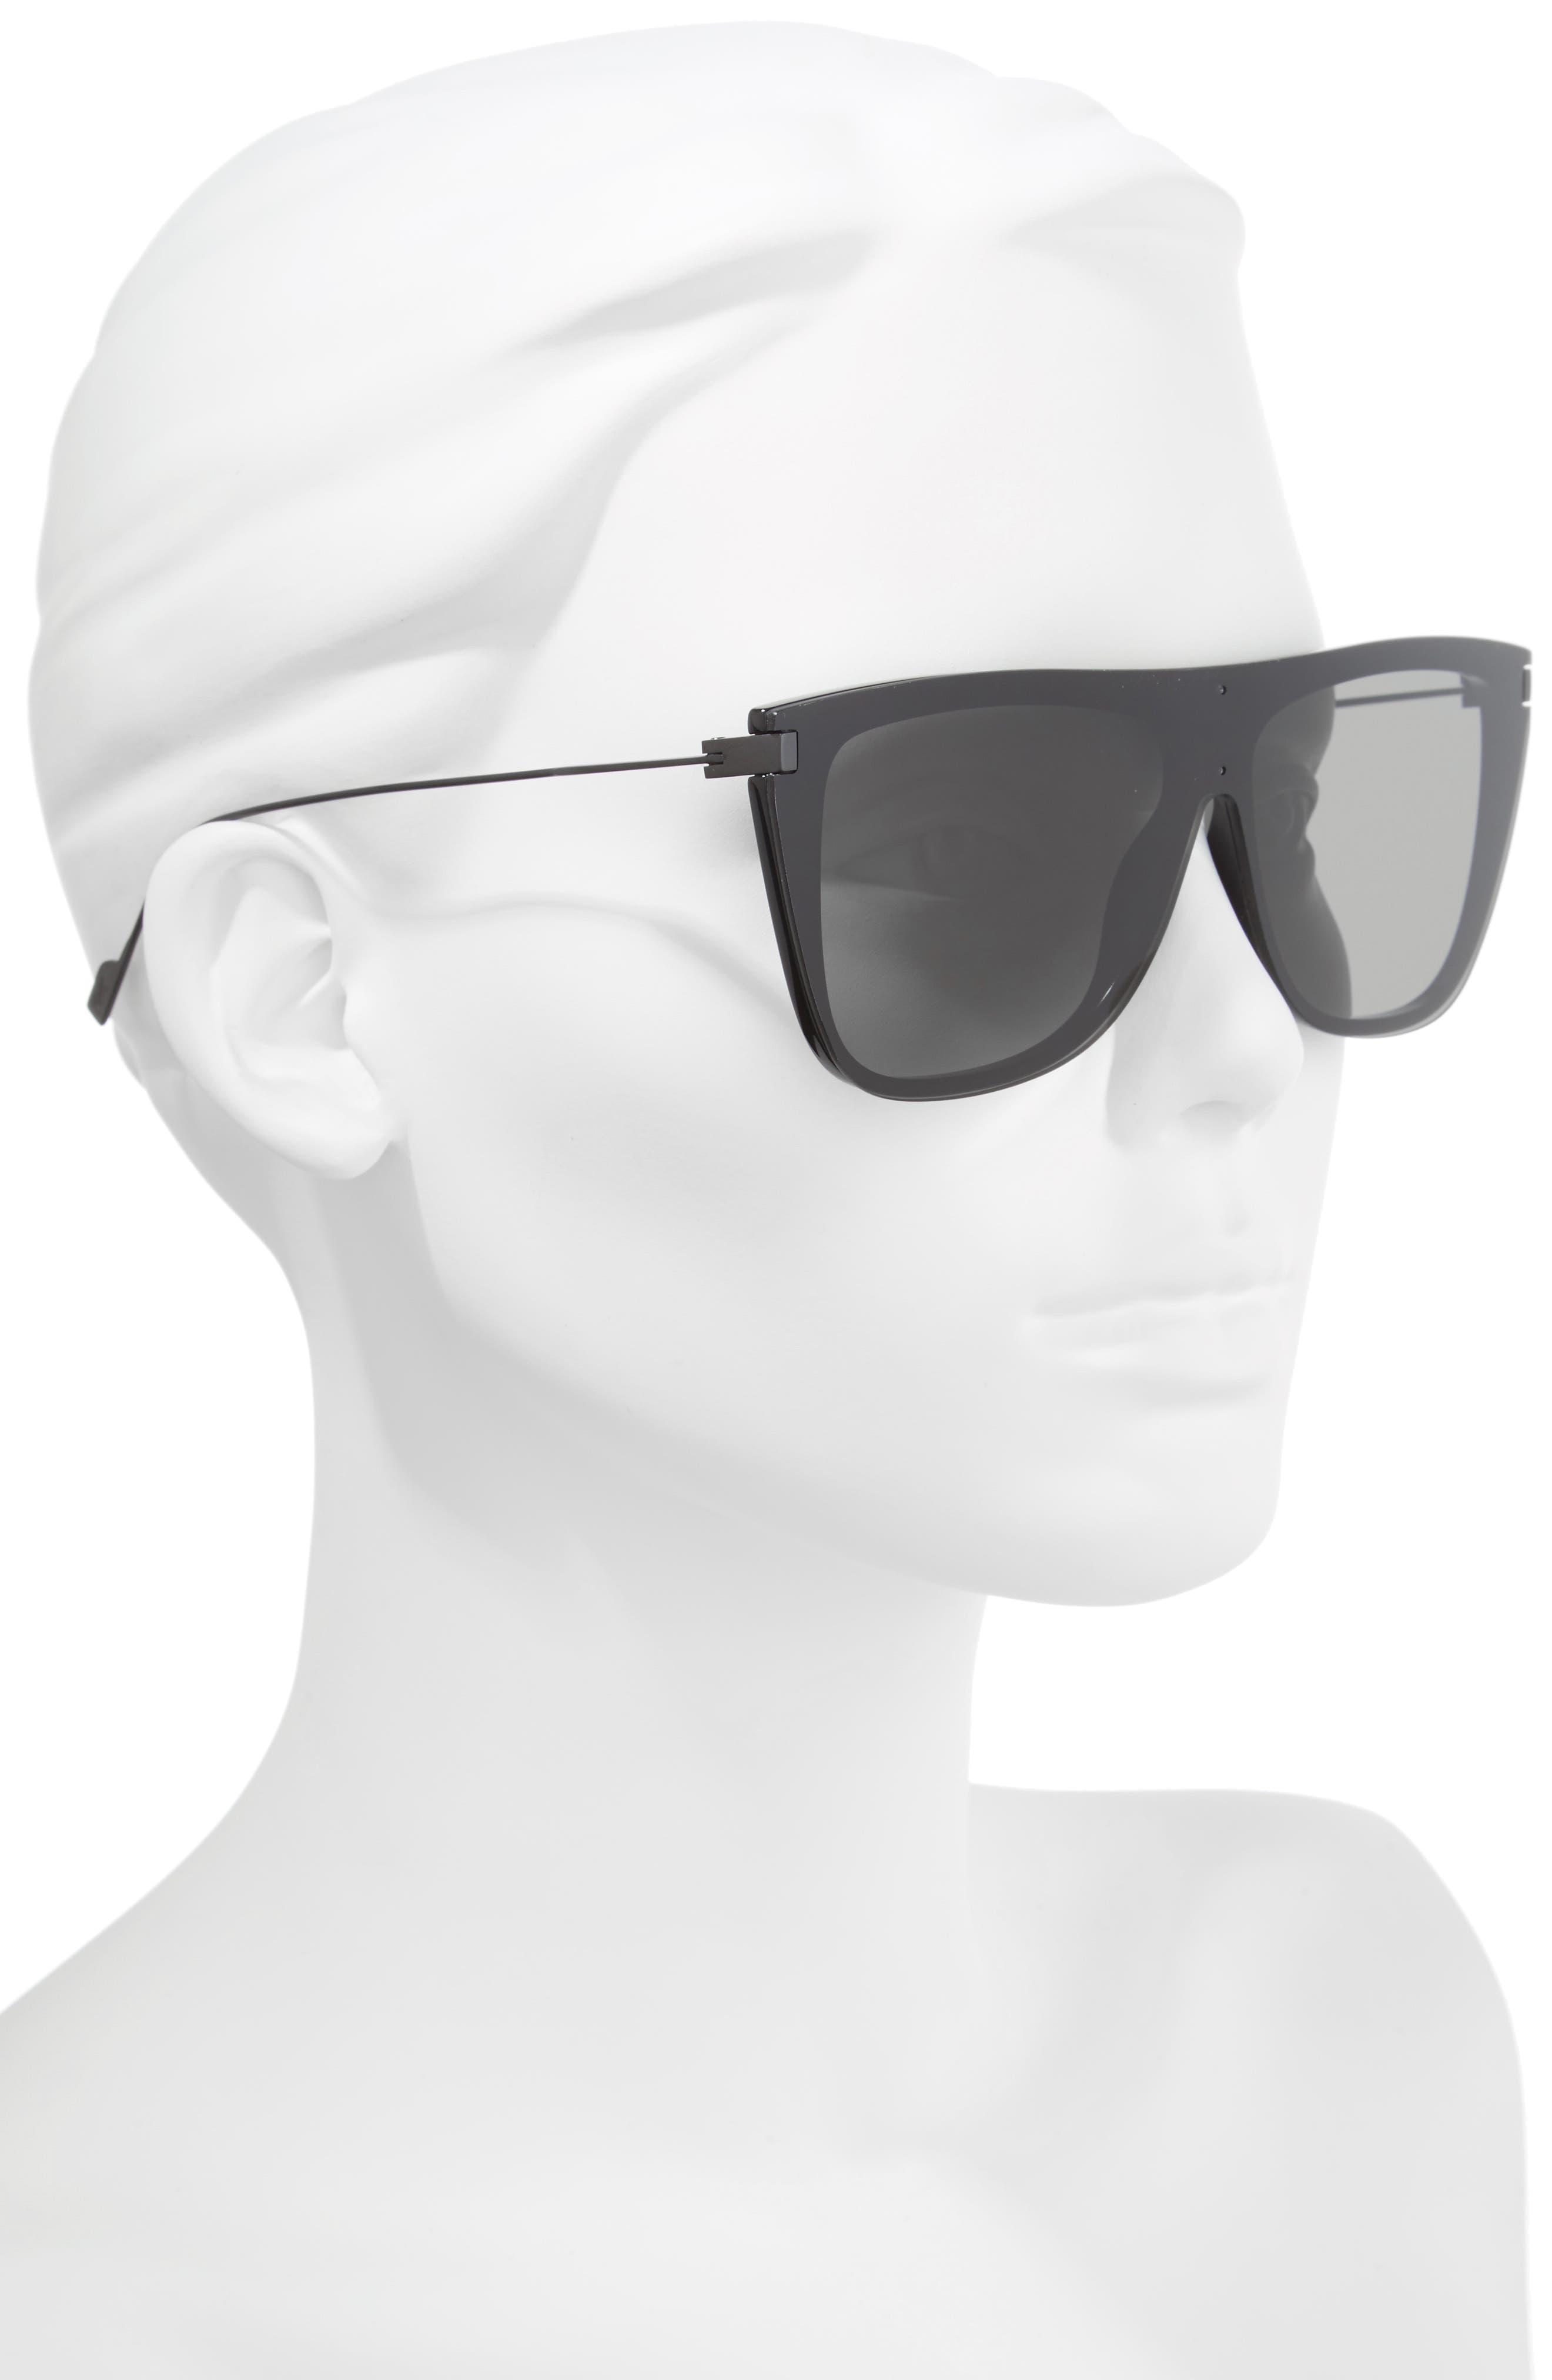 99mm Shield Sunglasses,                             Alternate thumbnail 2, color,                             Black